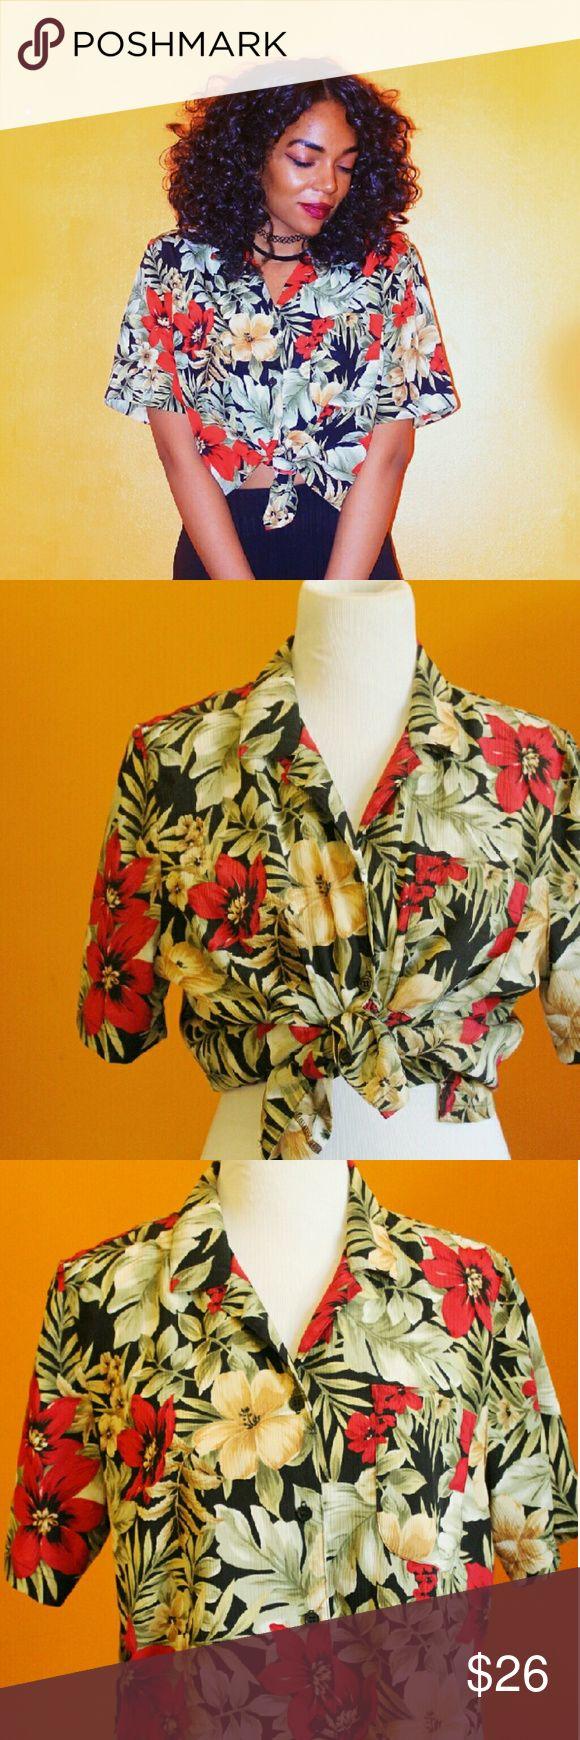 Vintage Red/Green/Black Hawaiian Shirt Great button down shirt! Tops Button Down Shirts